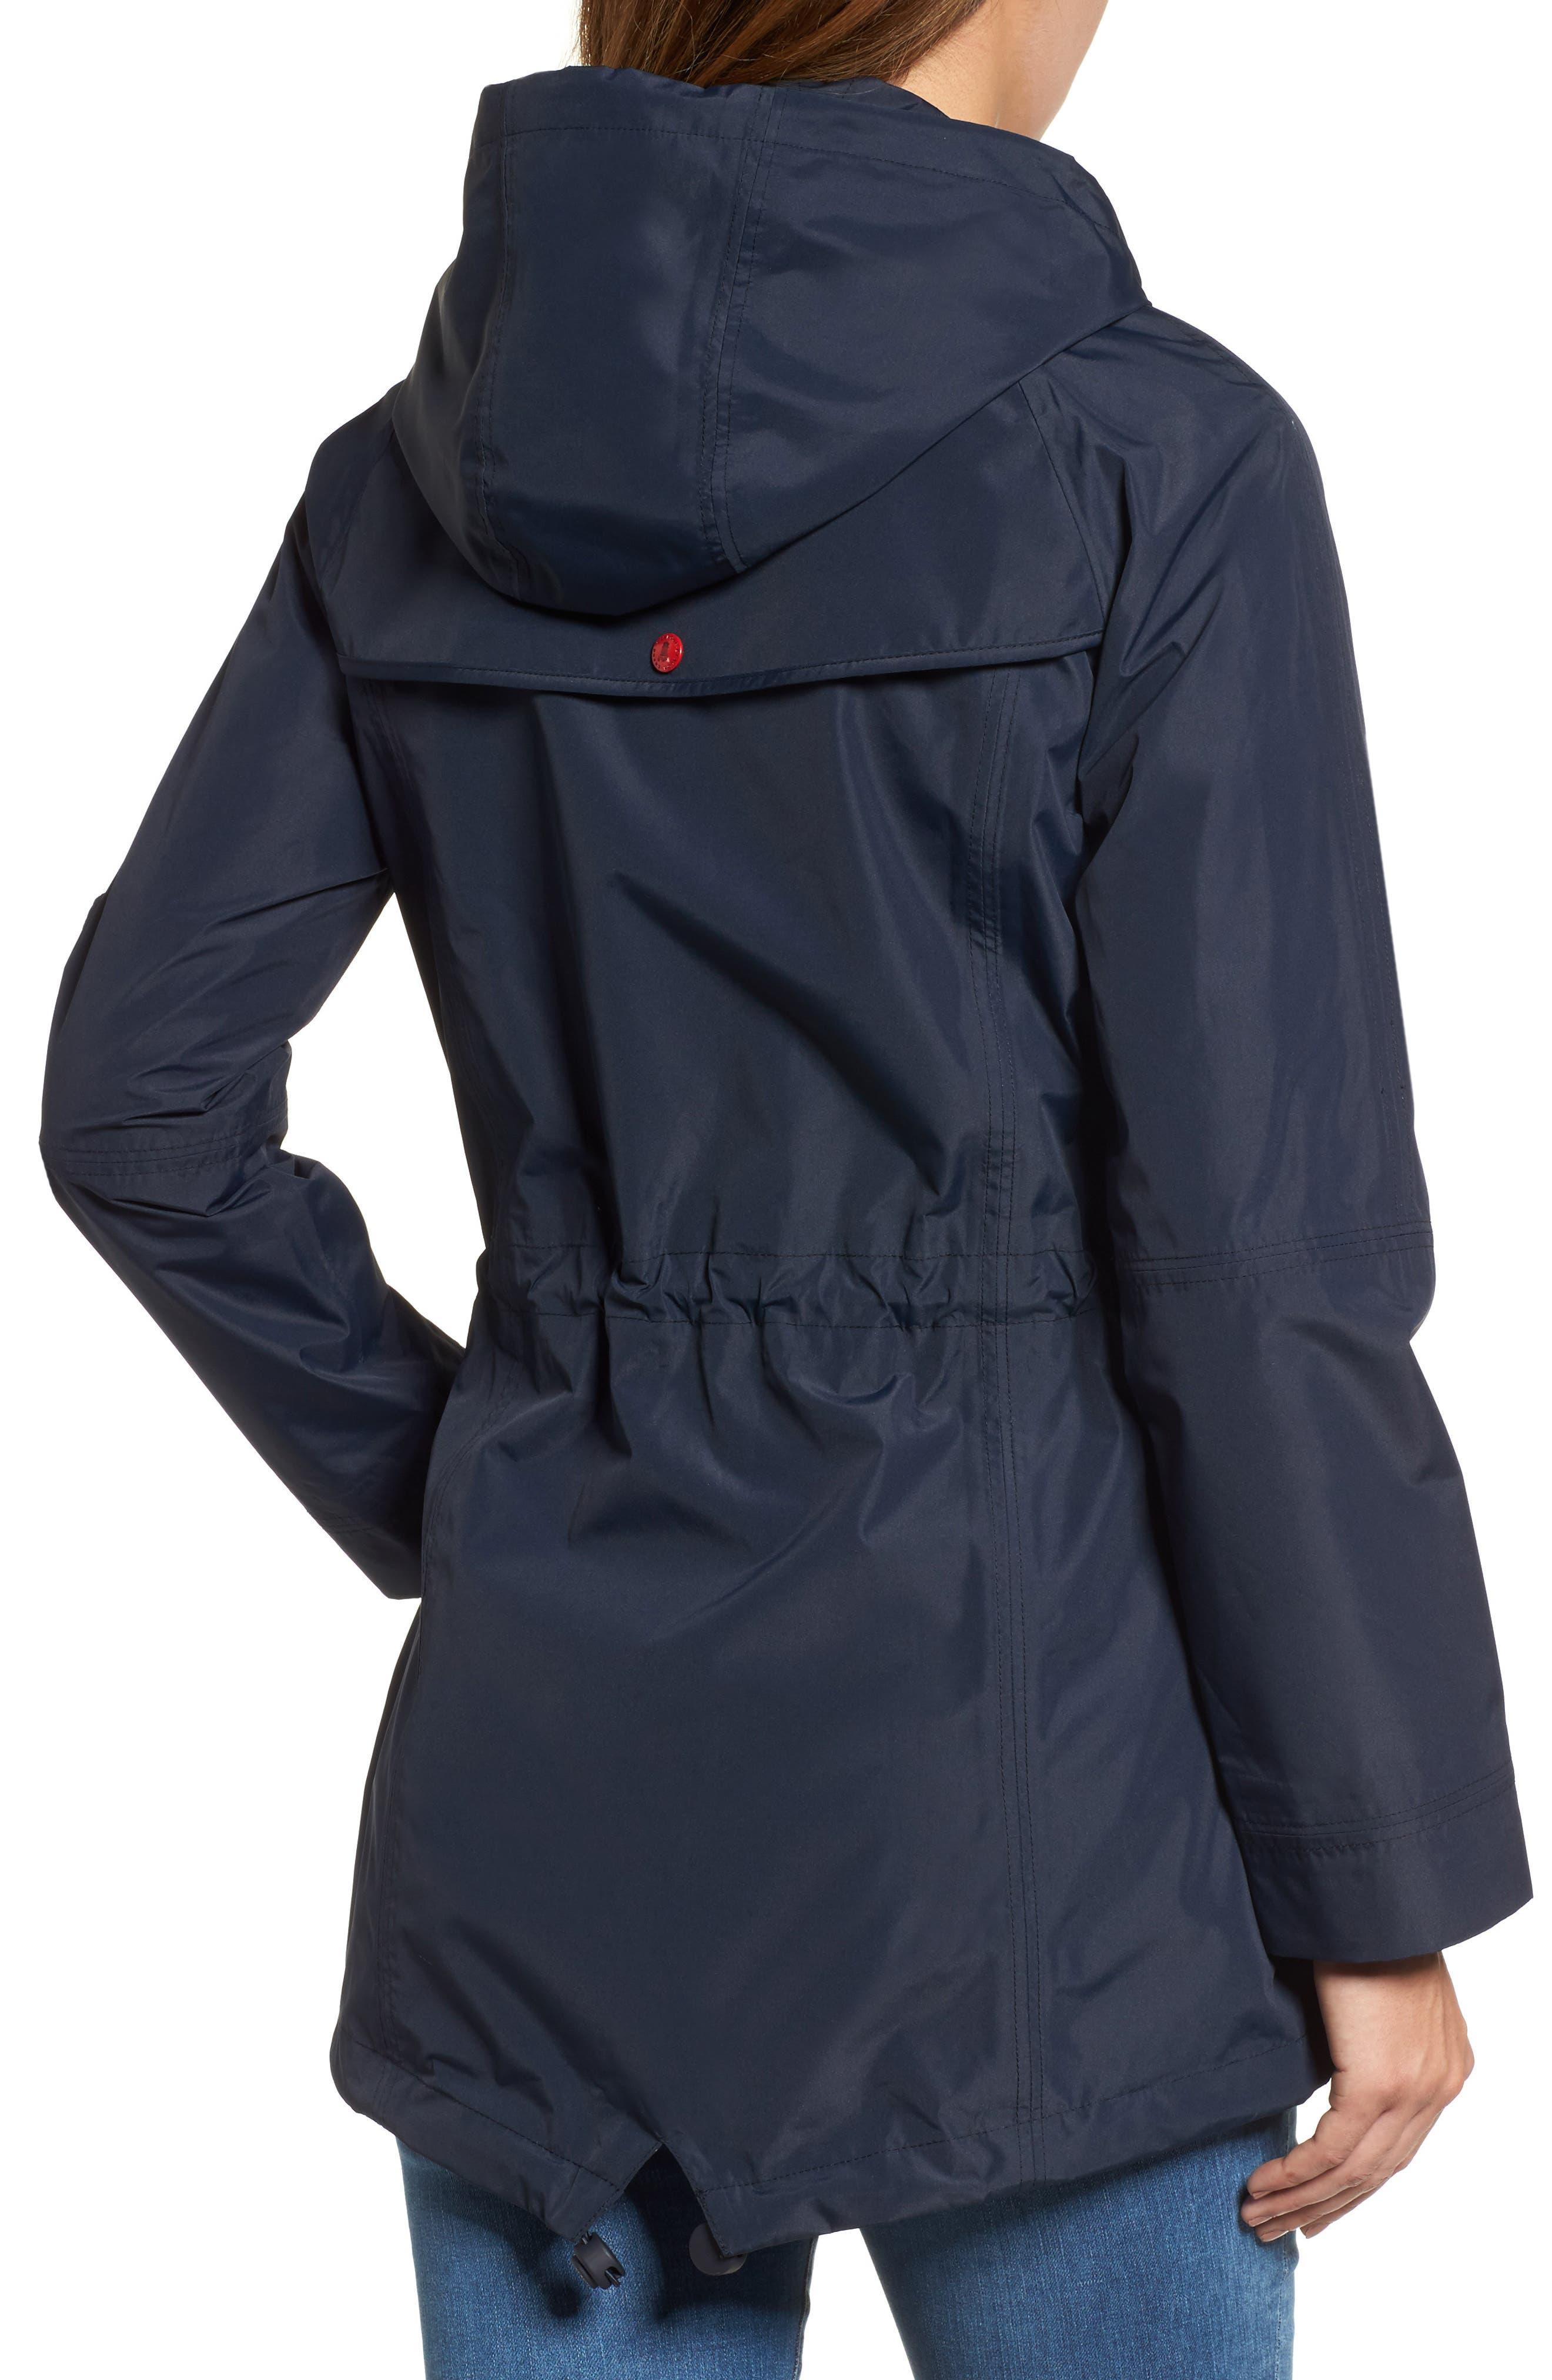 Trevose Hooded Jacket,                             Alternate thumbnail 2, color,                             Navy